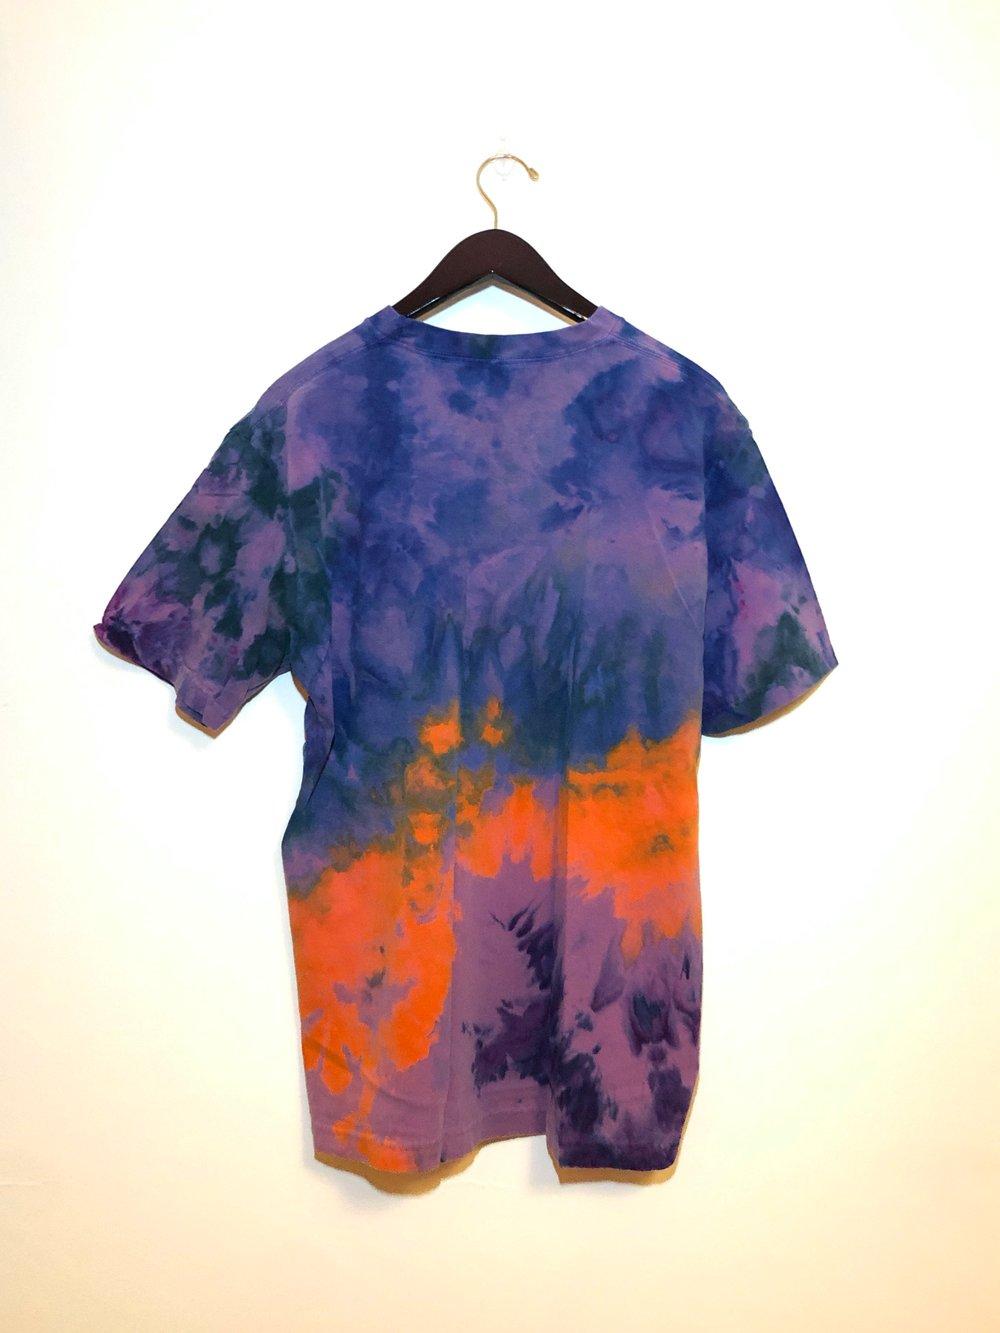 Shirt #33 - Medium